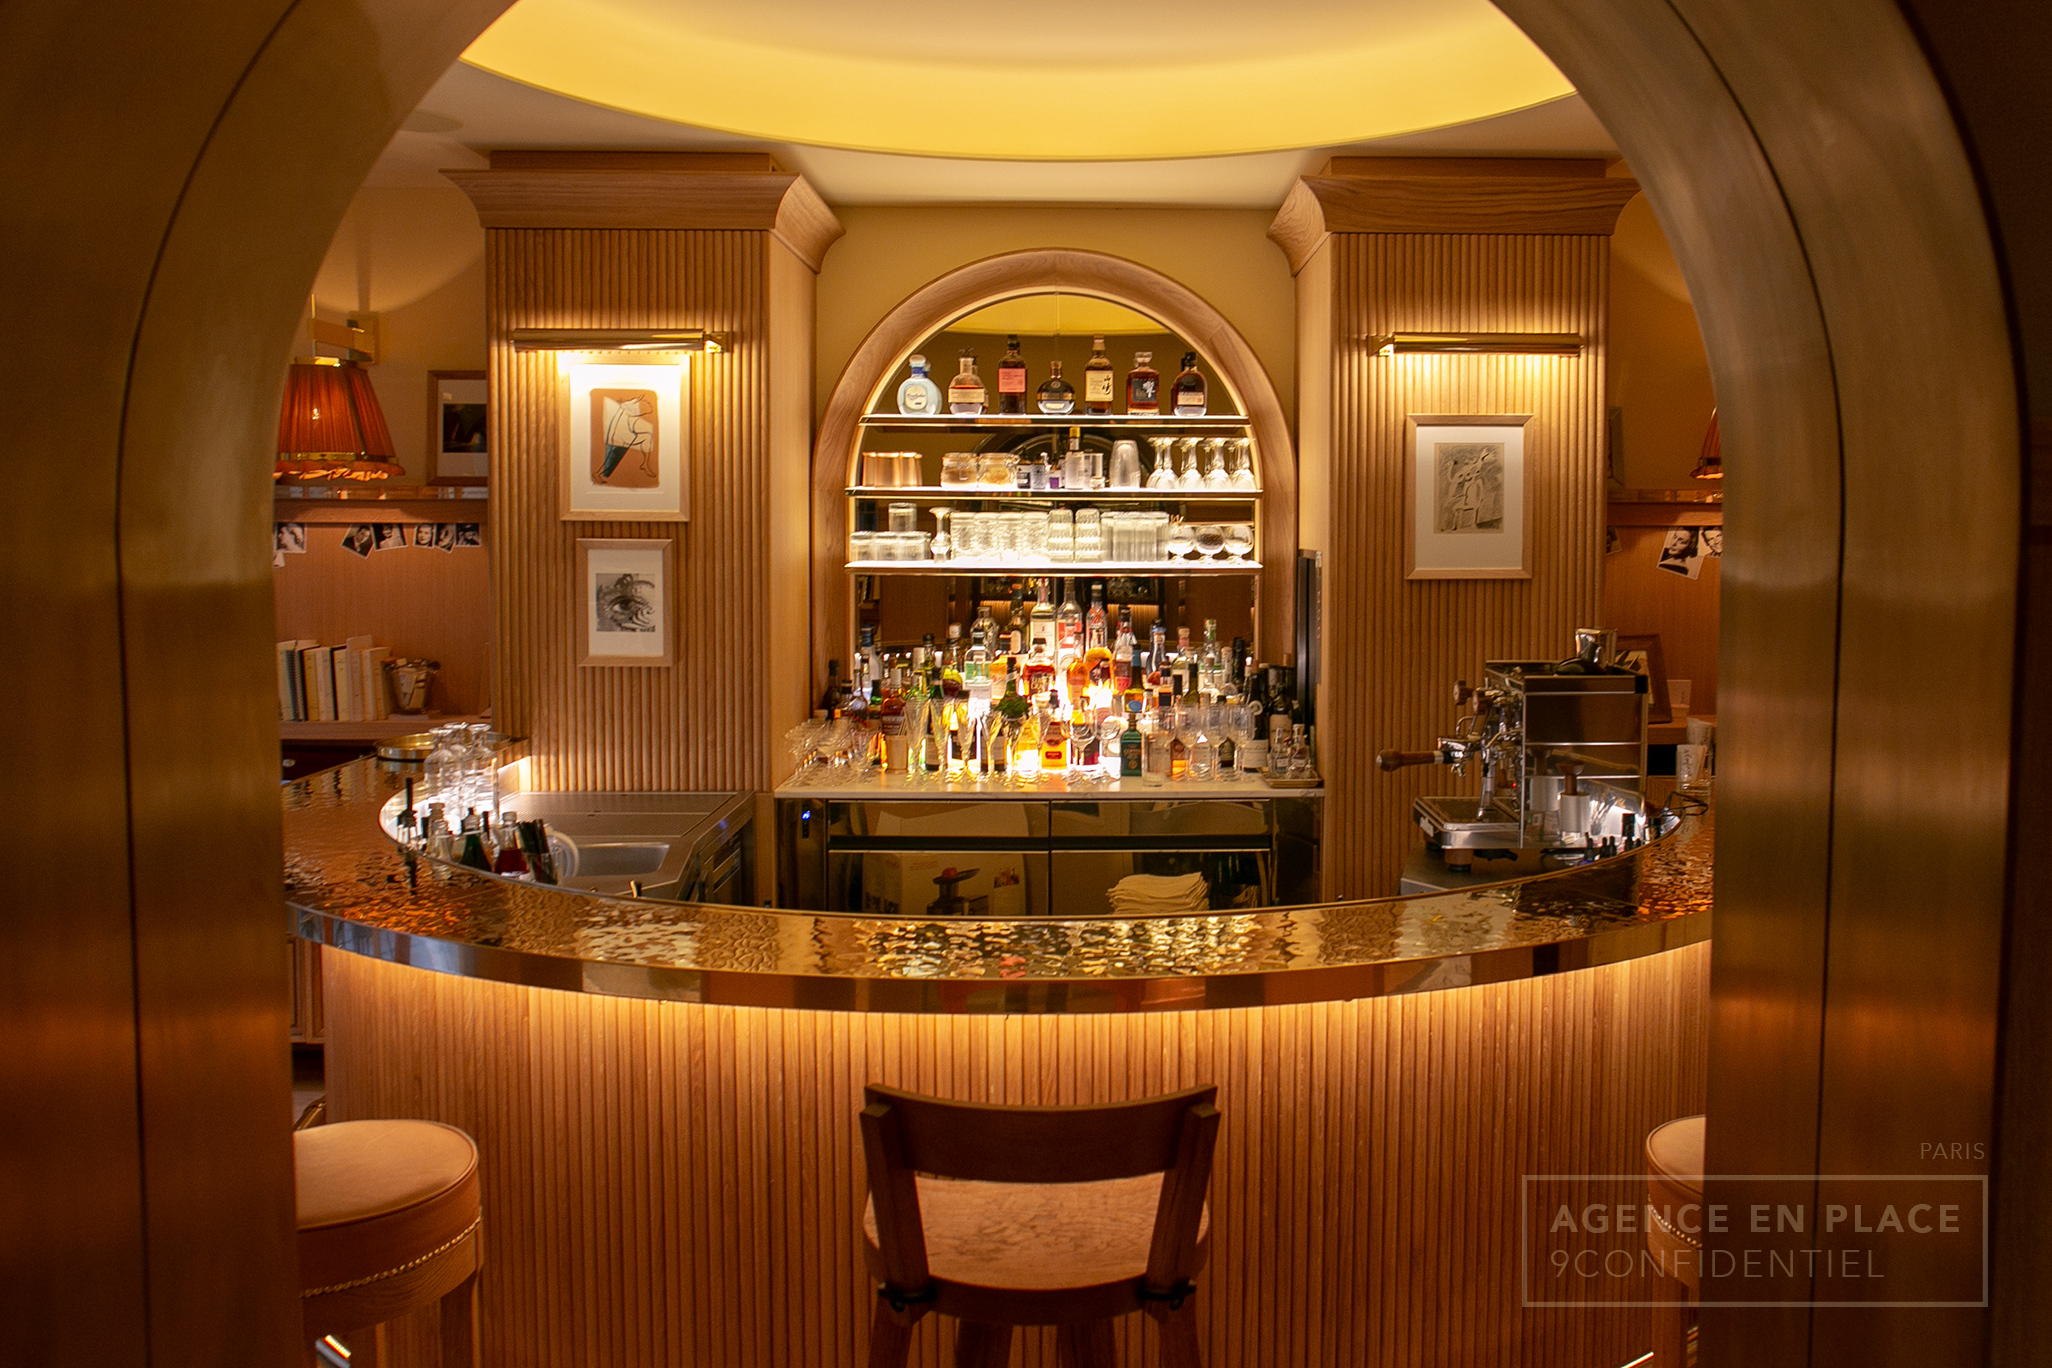 agence-en-place-9confidentiel-hotel-starck-cocktails-001